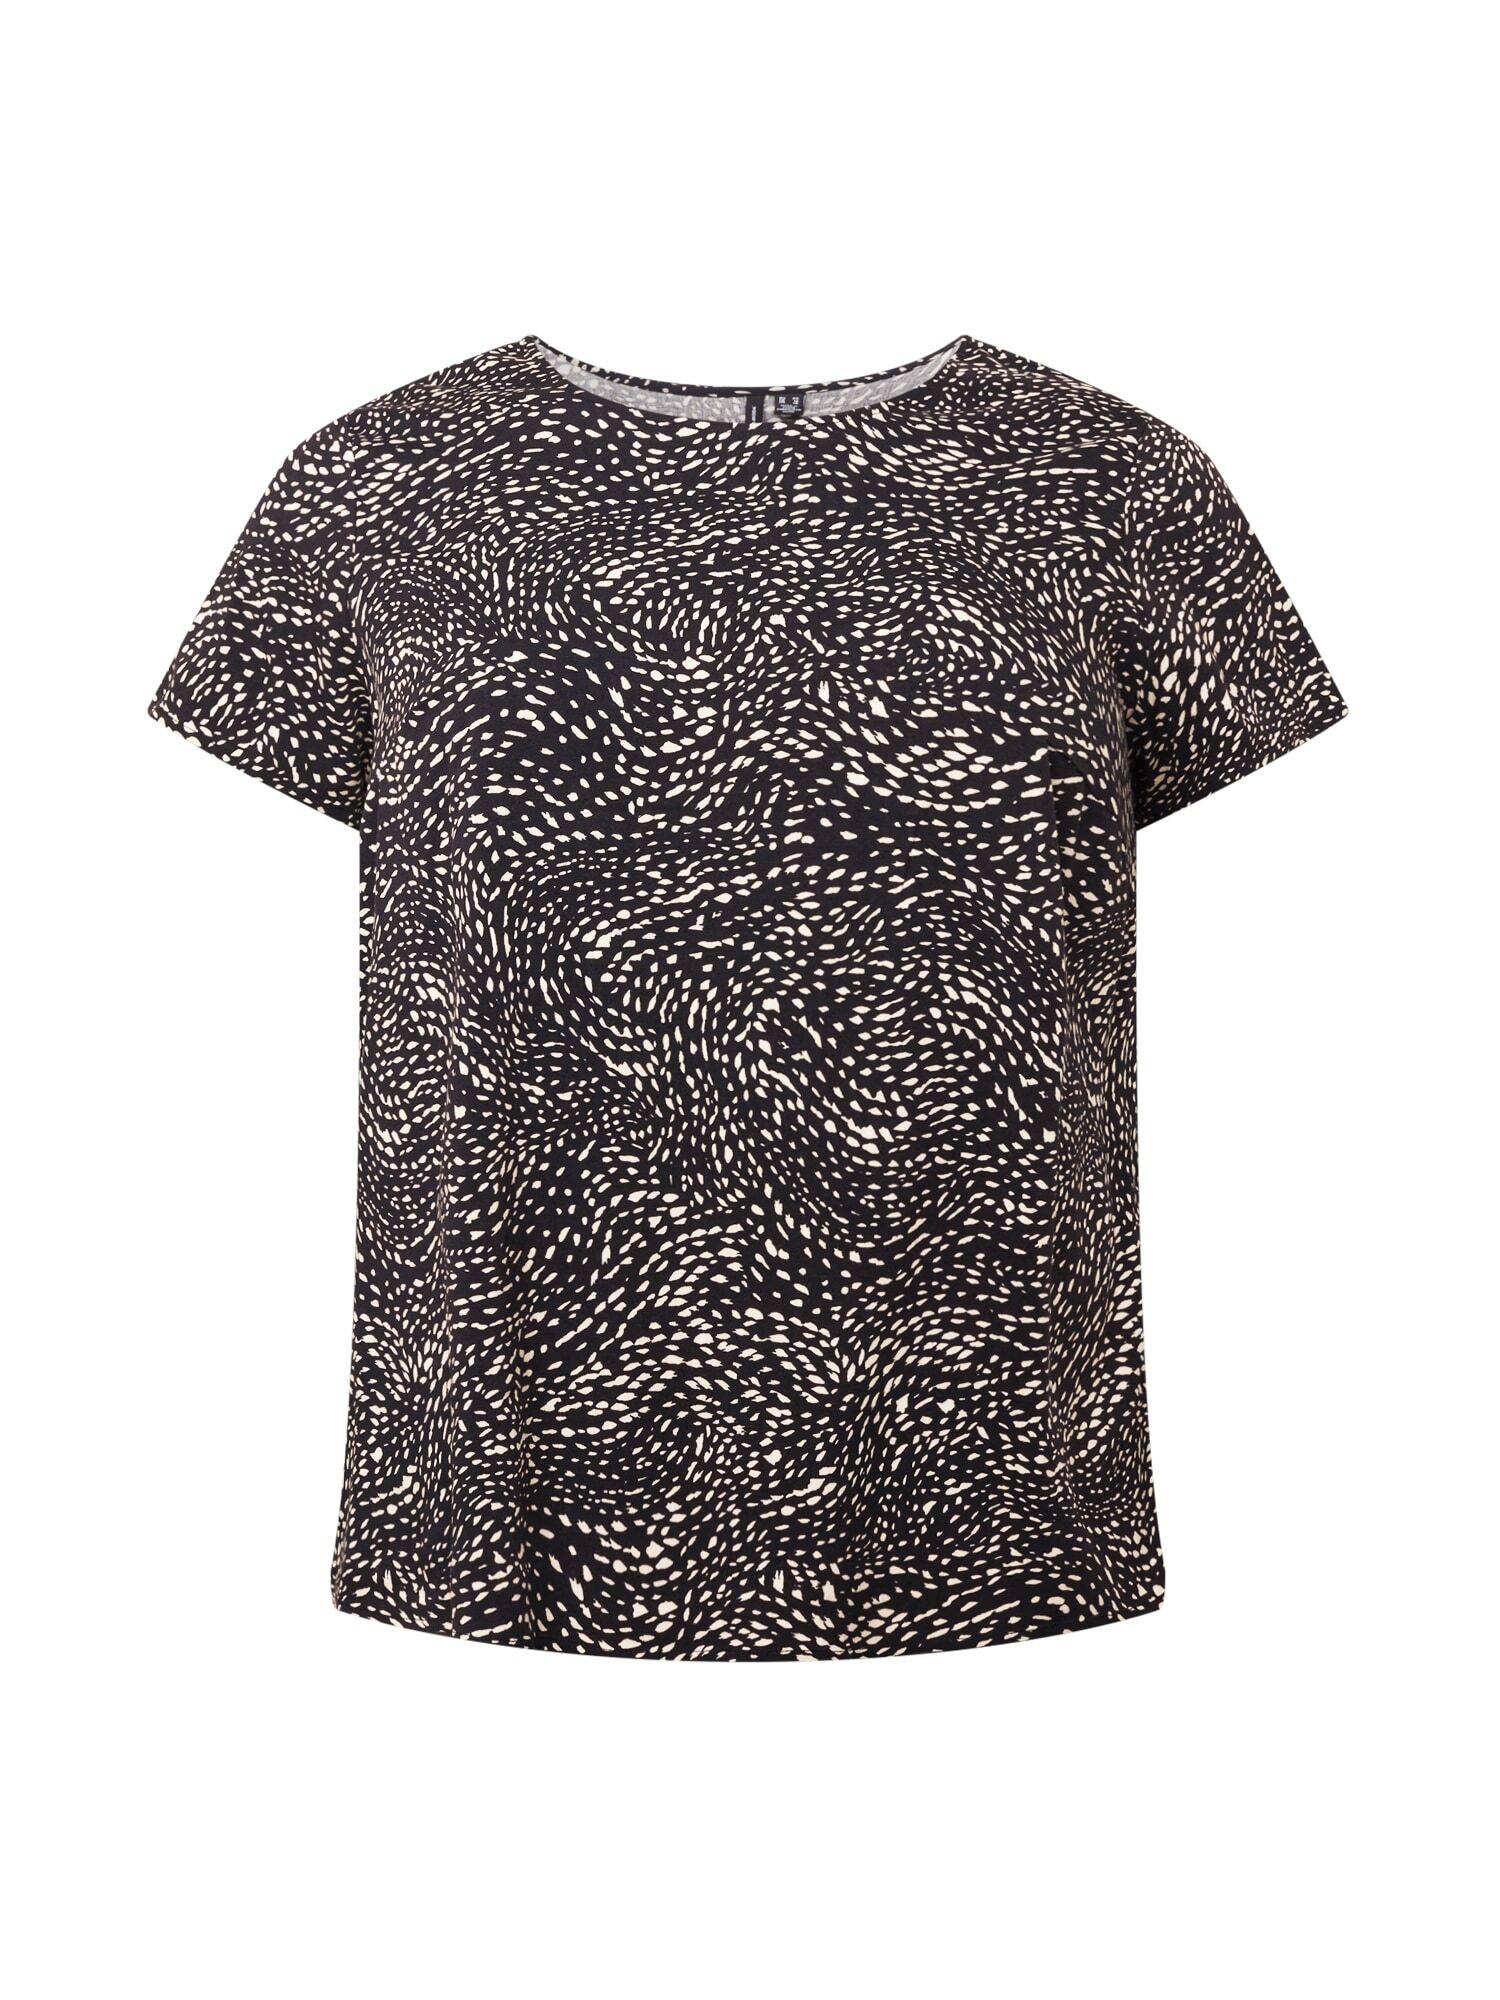 Vero Moda Curve T-shirt 'BACA'  - Noir - Taille: 44 - female